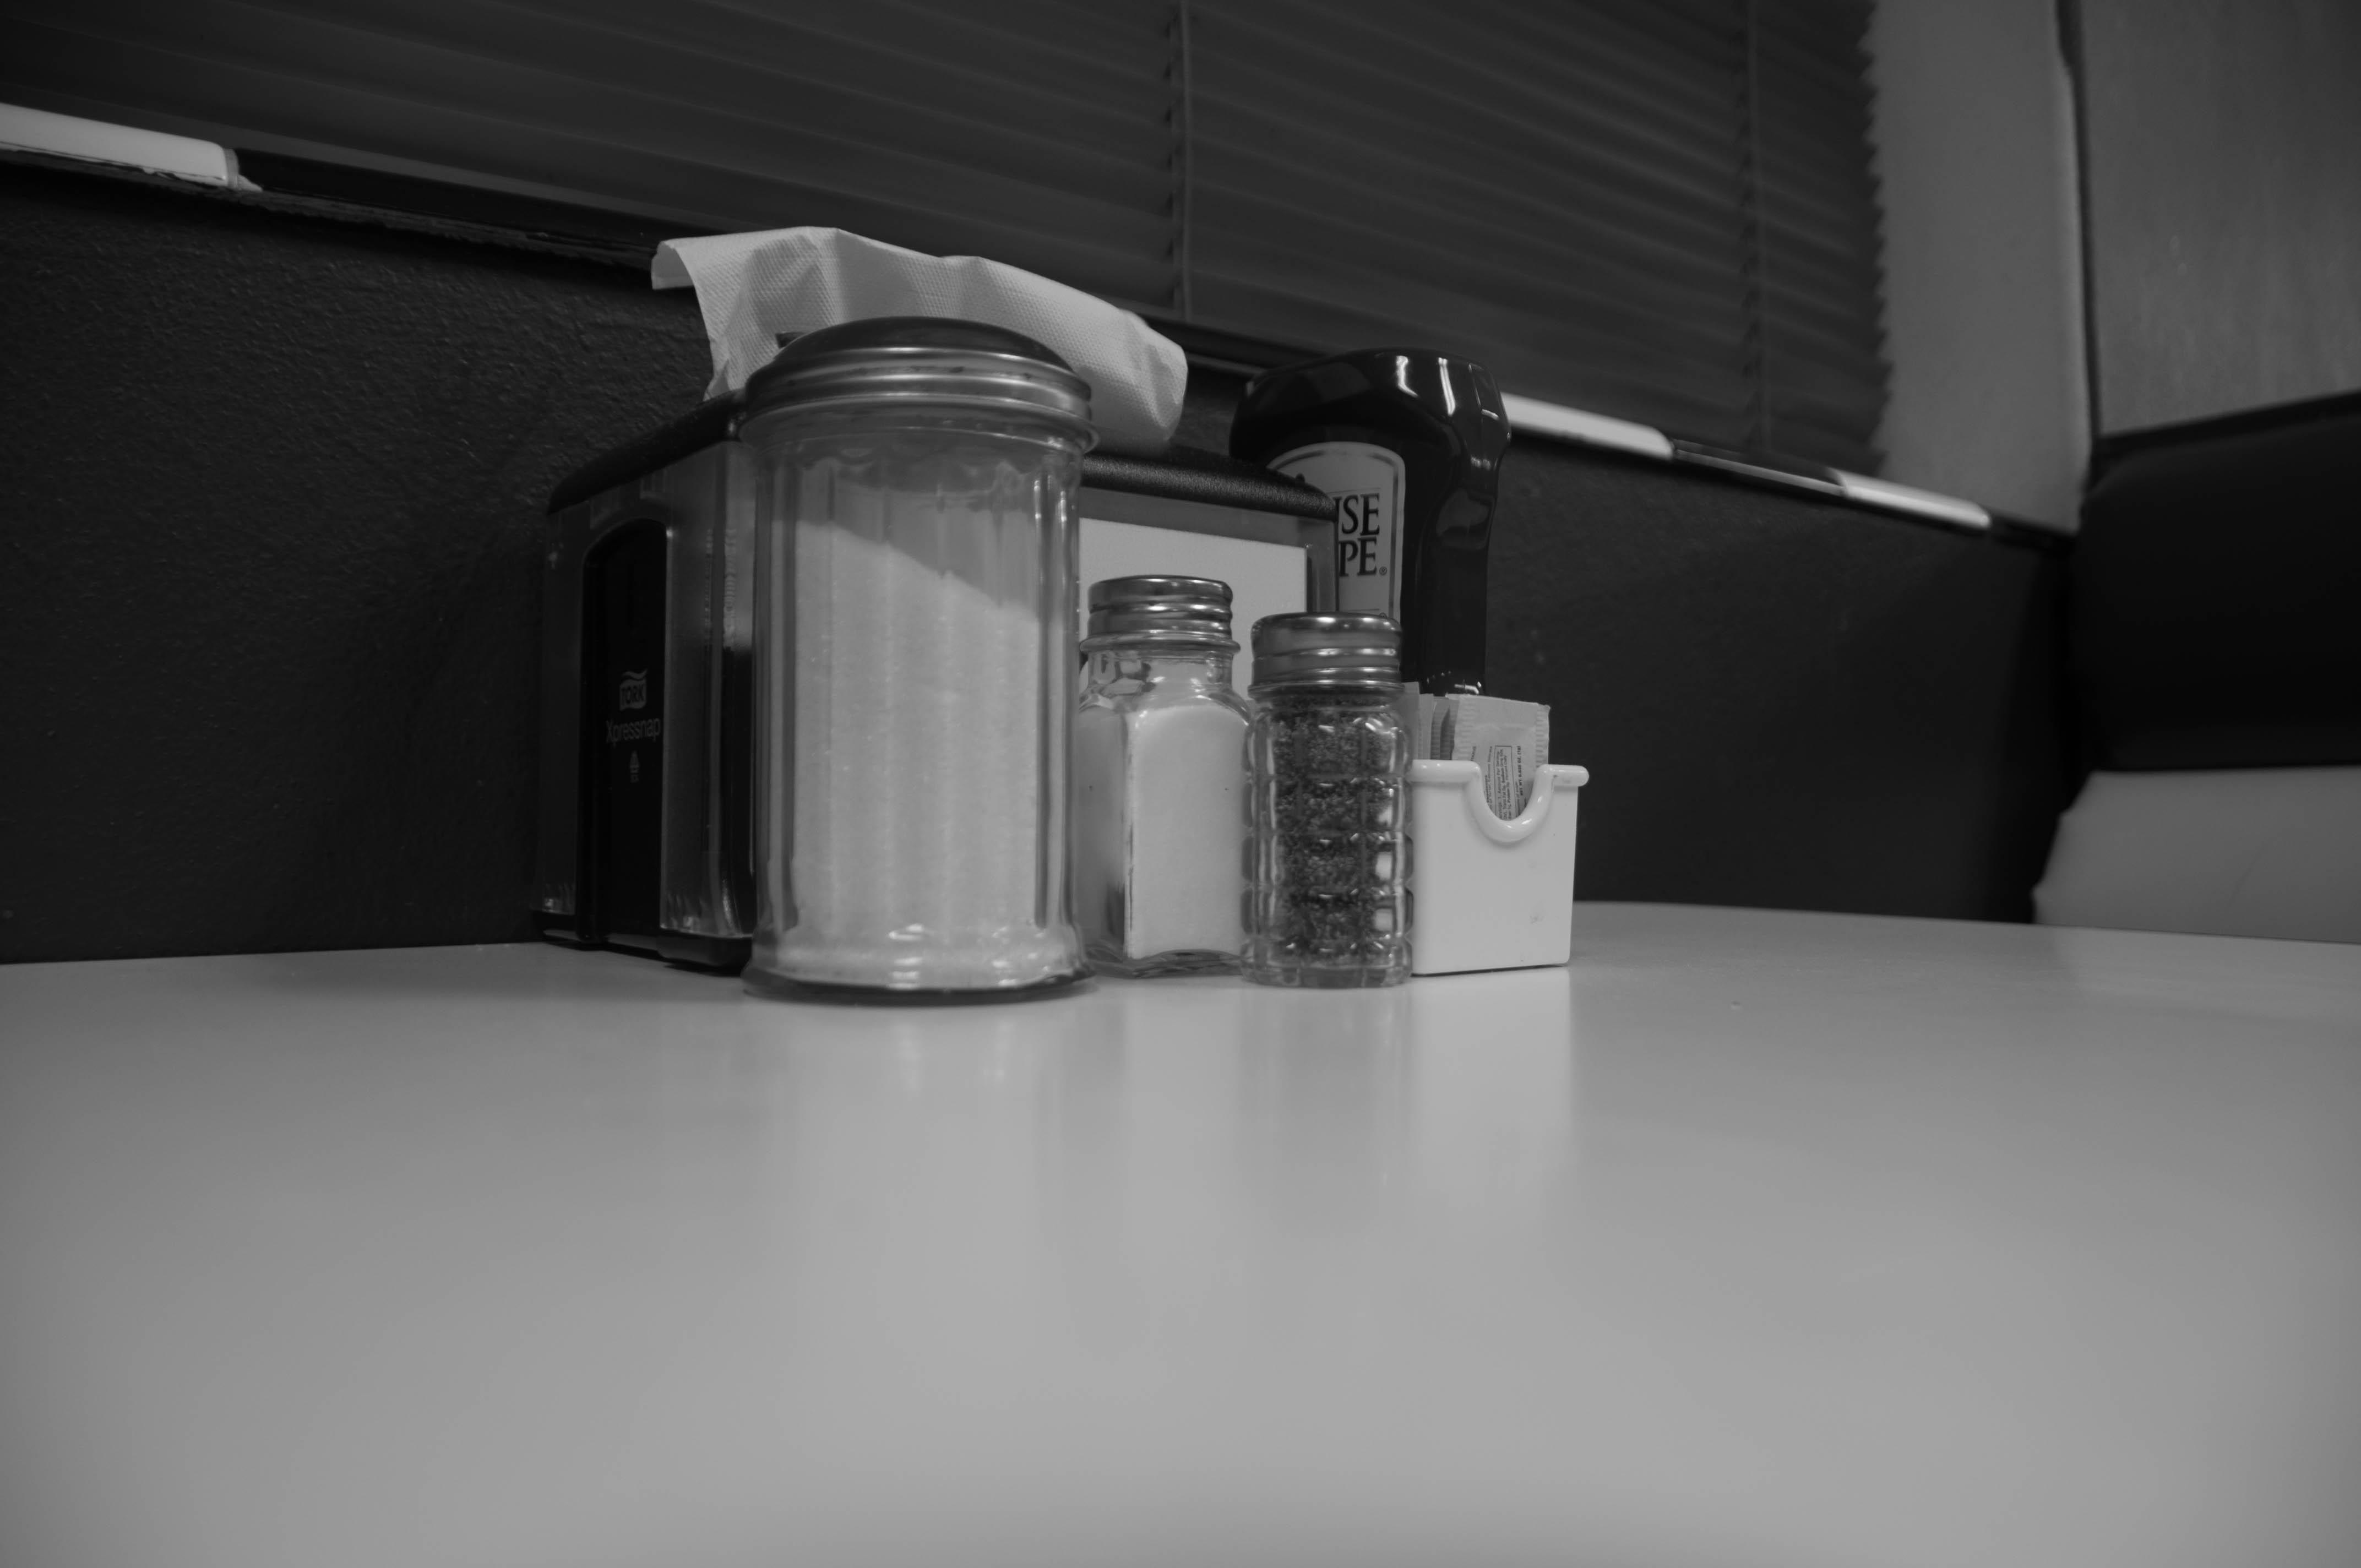 Diner Ketchup, Restaurant, Pepper, Interior, Rural, HQ Photo